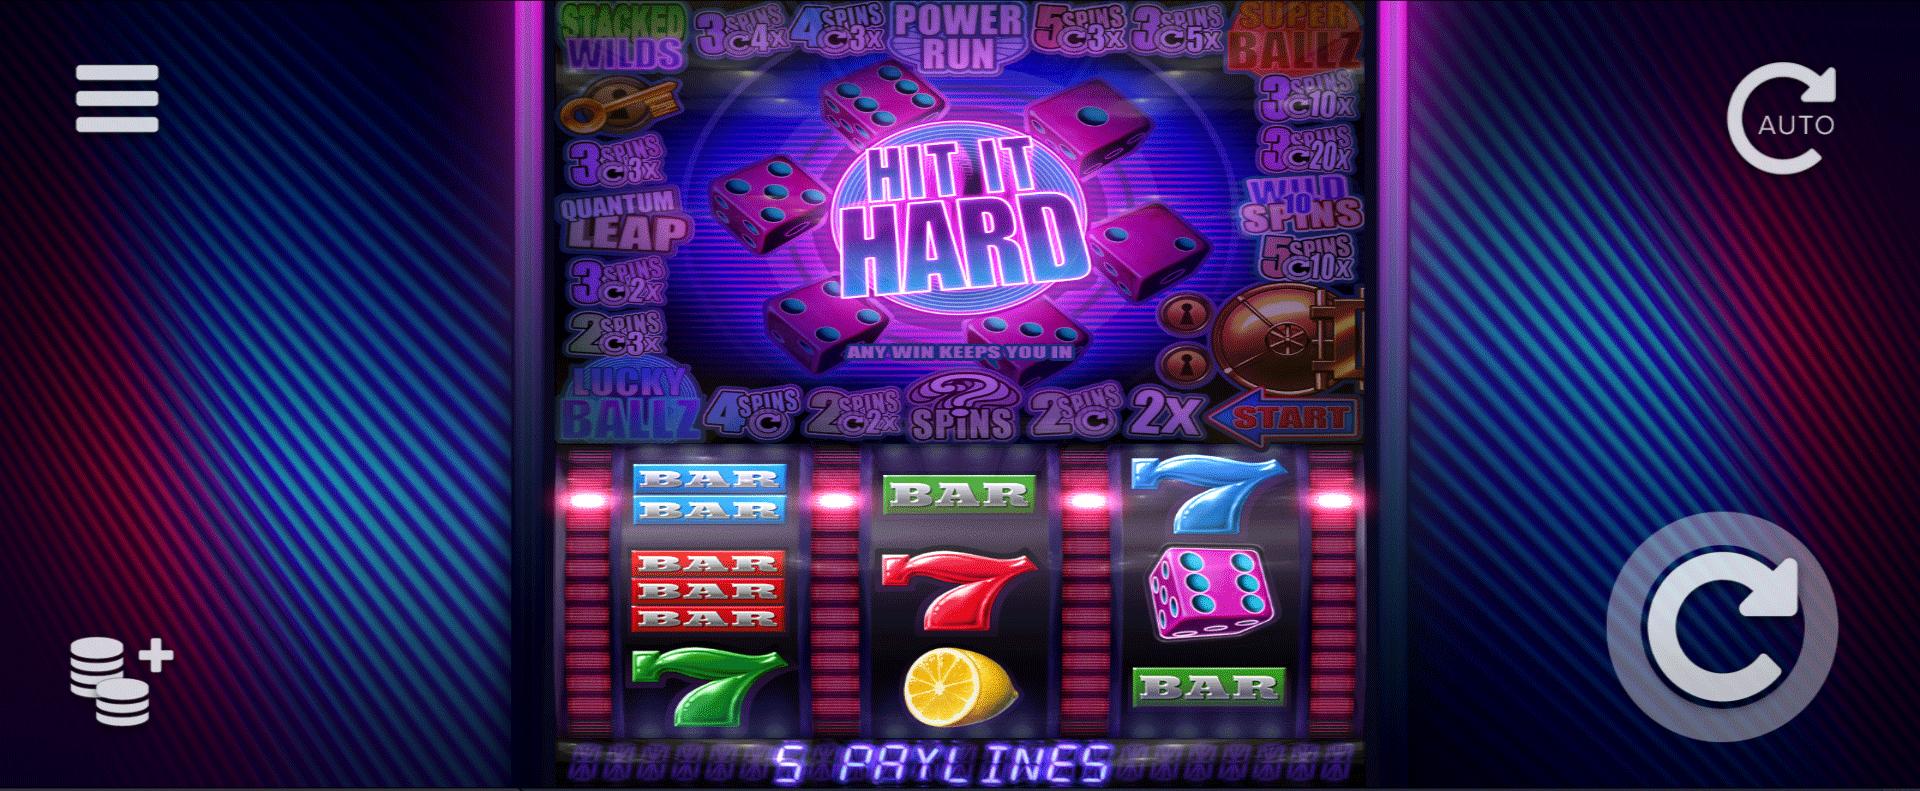 Slot Hit it Hard